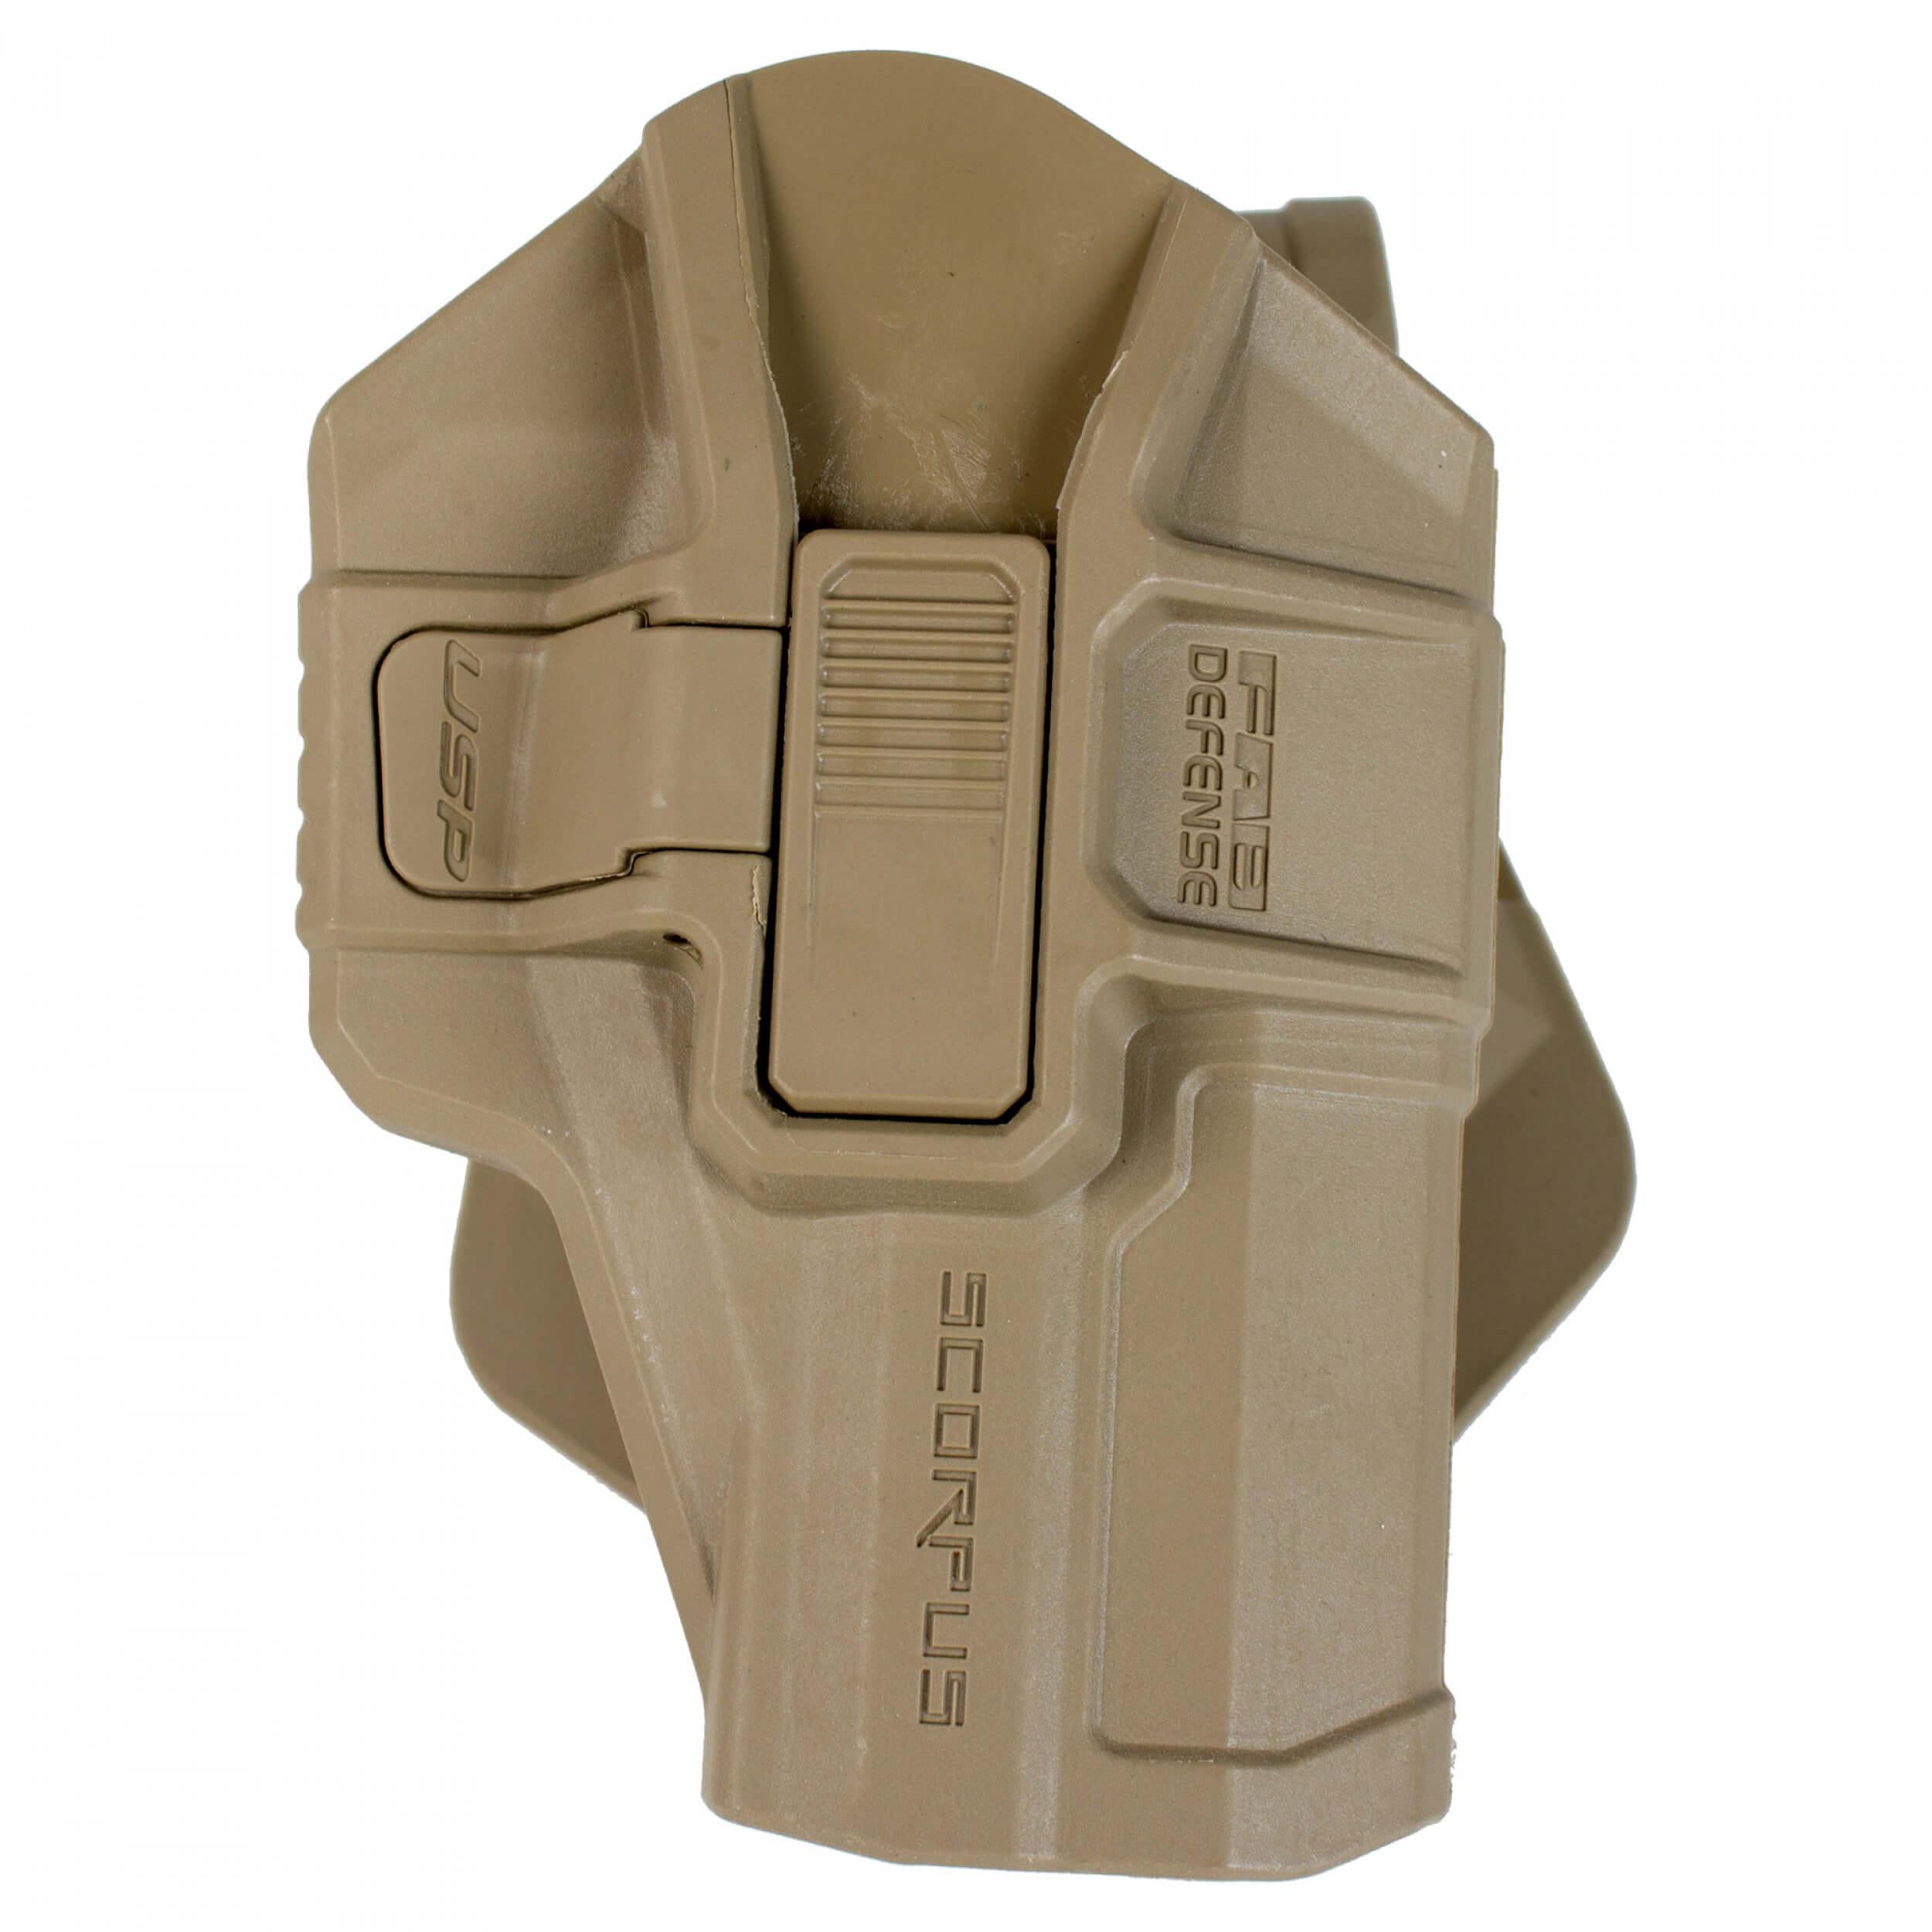 FAB Defense H&K P8 USP SR Level 2 Scorpus Swivel Retention Holster tan